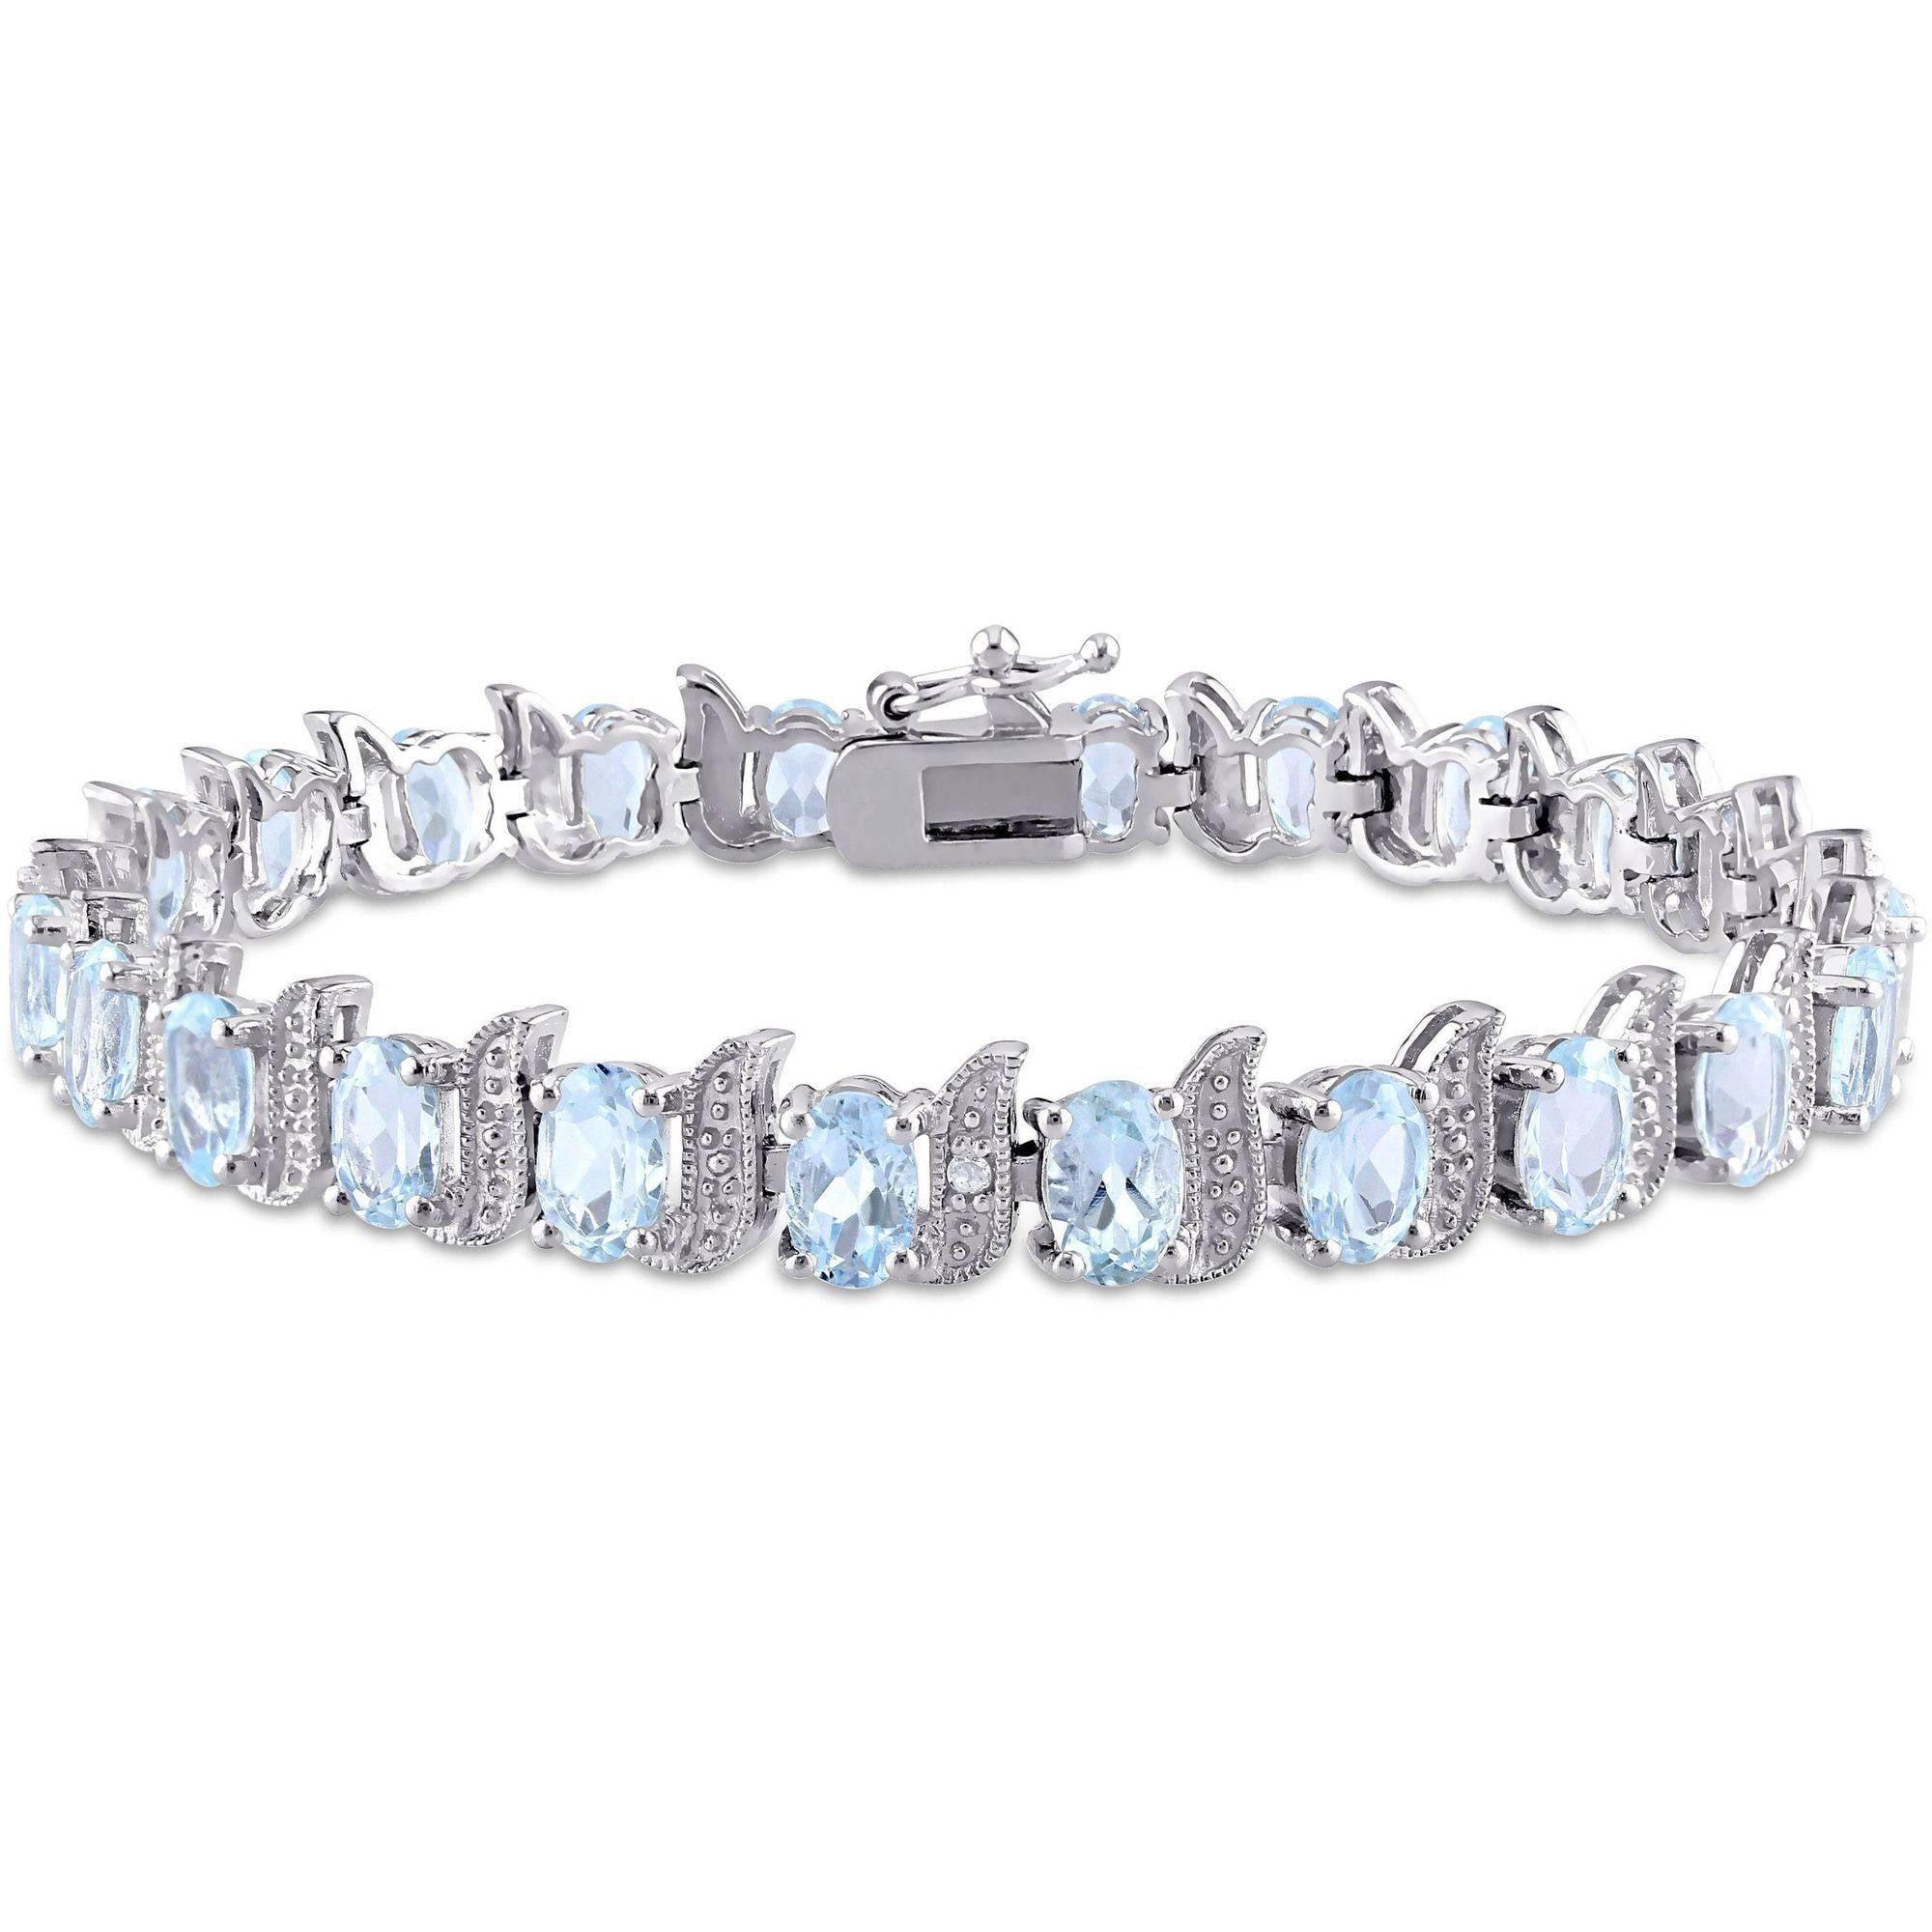 "Tangelo 12 Carat T.G.W. Sky Blue Topaz and Diamond-Accent Sterling Silver Tennis Bracelet, 7"" by Tangelo"